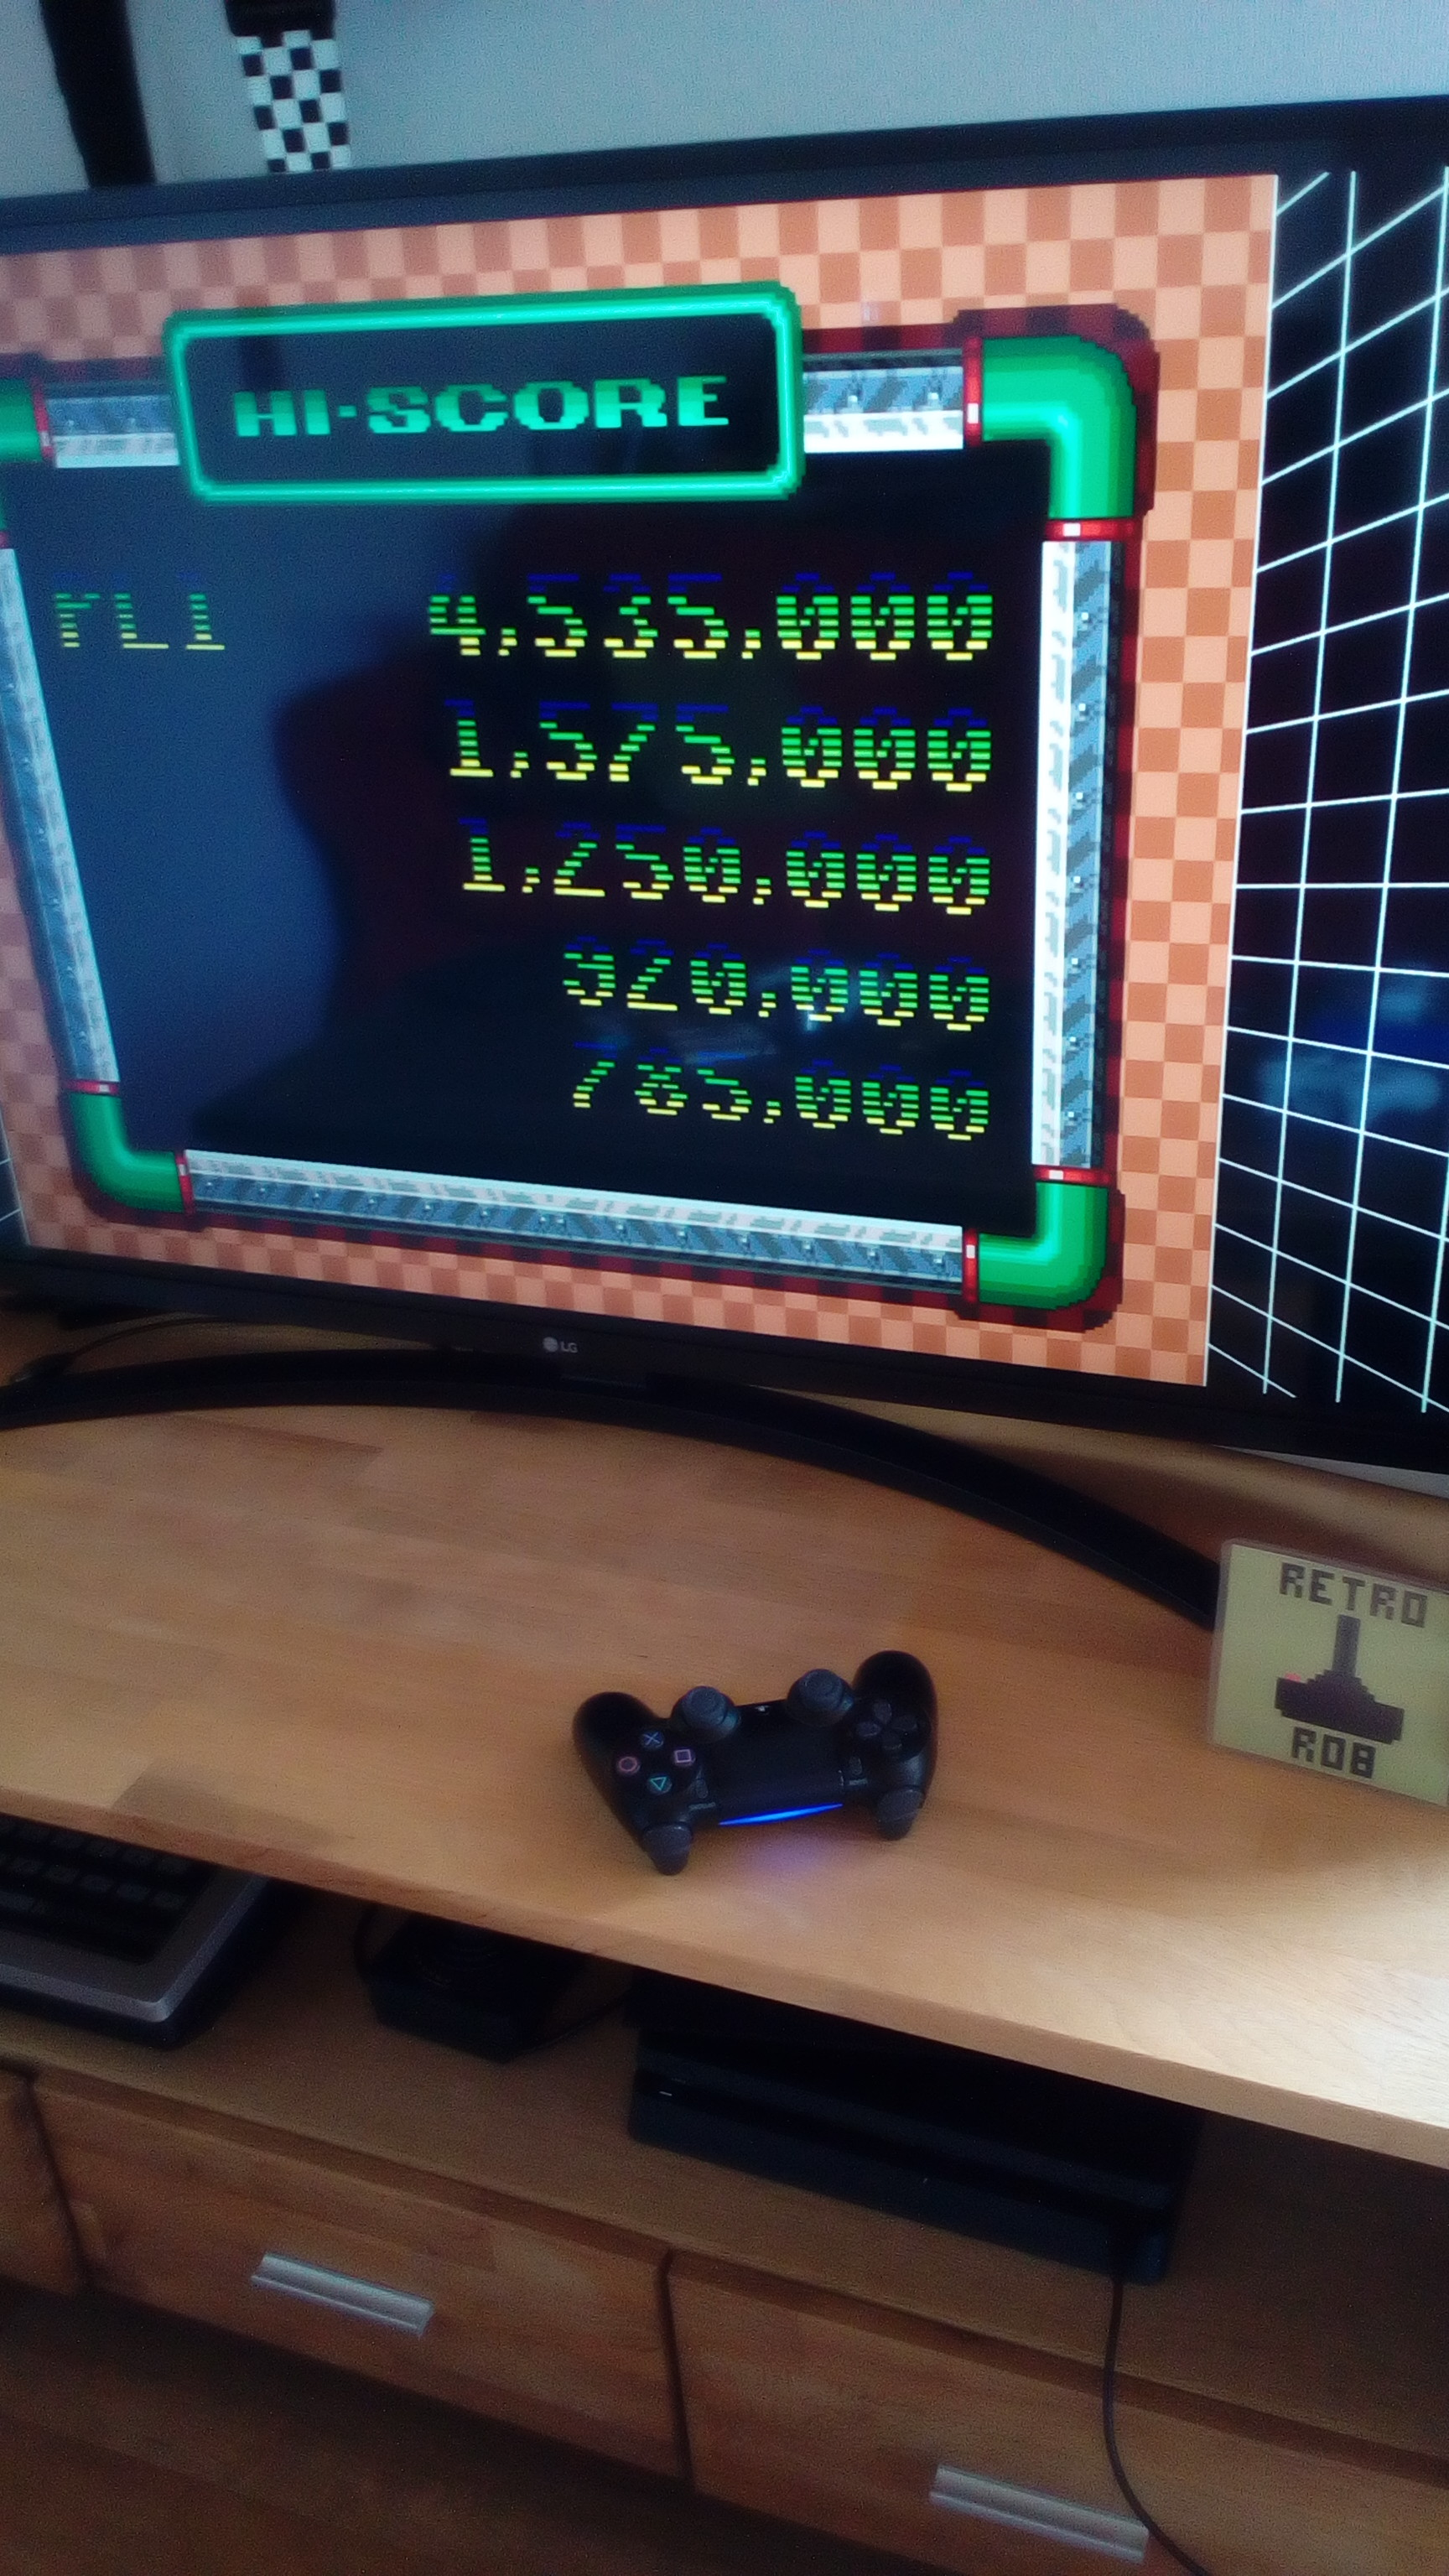 RetroRob: Sega Genesis Classics: Sonic Spinball (Playstation 4) 4,535,000 points on 2020-08-04 05:25:23